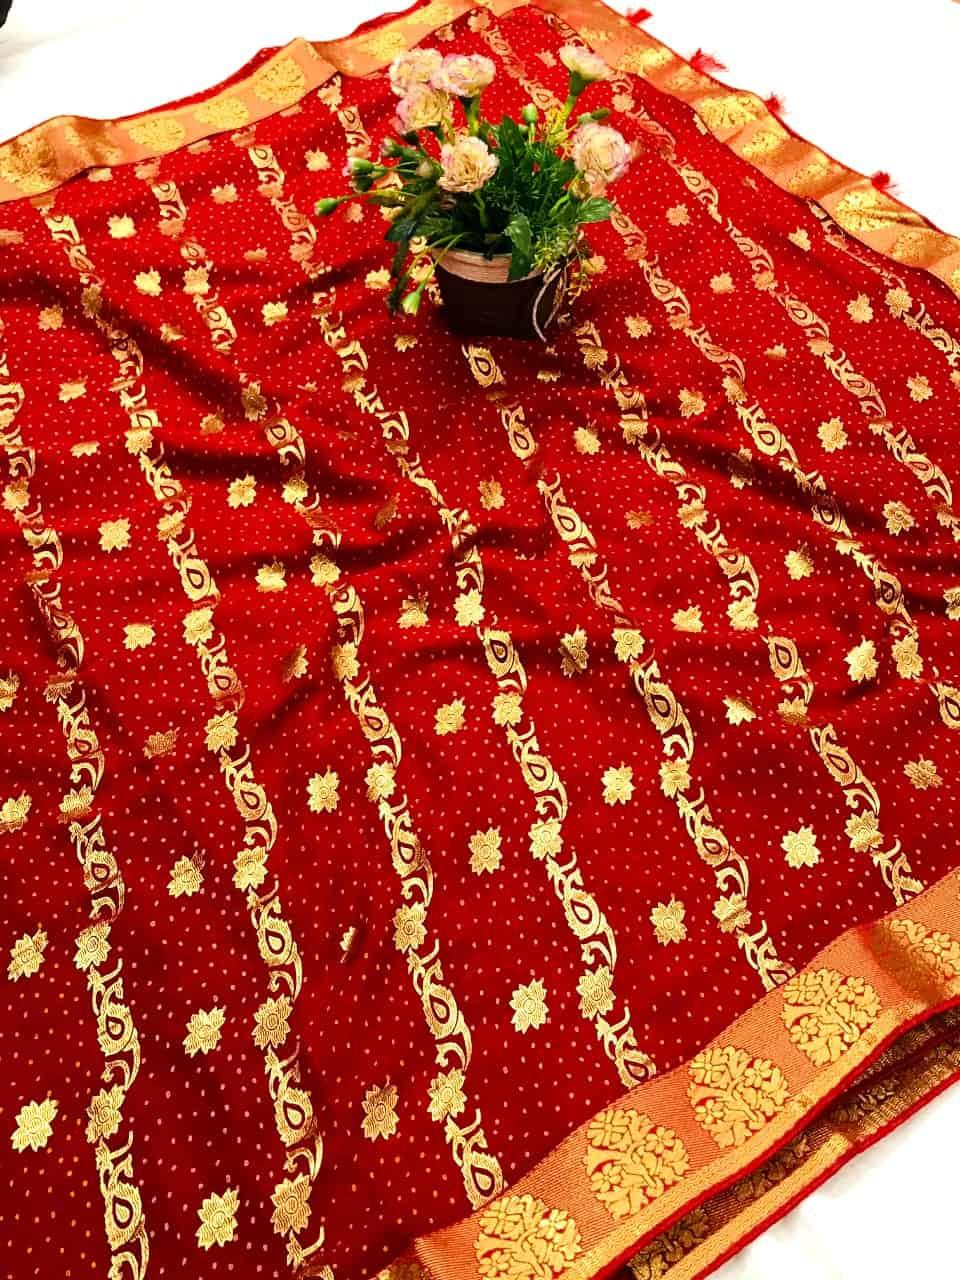 Charming Maroon Colored marbal chiffon printed saree dvz0002521